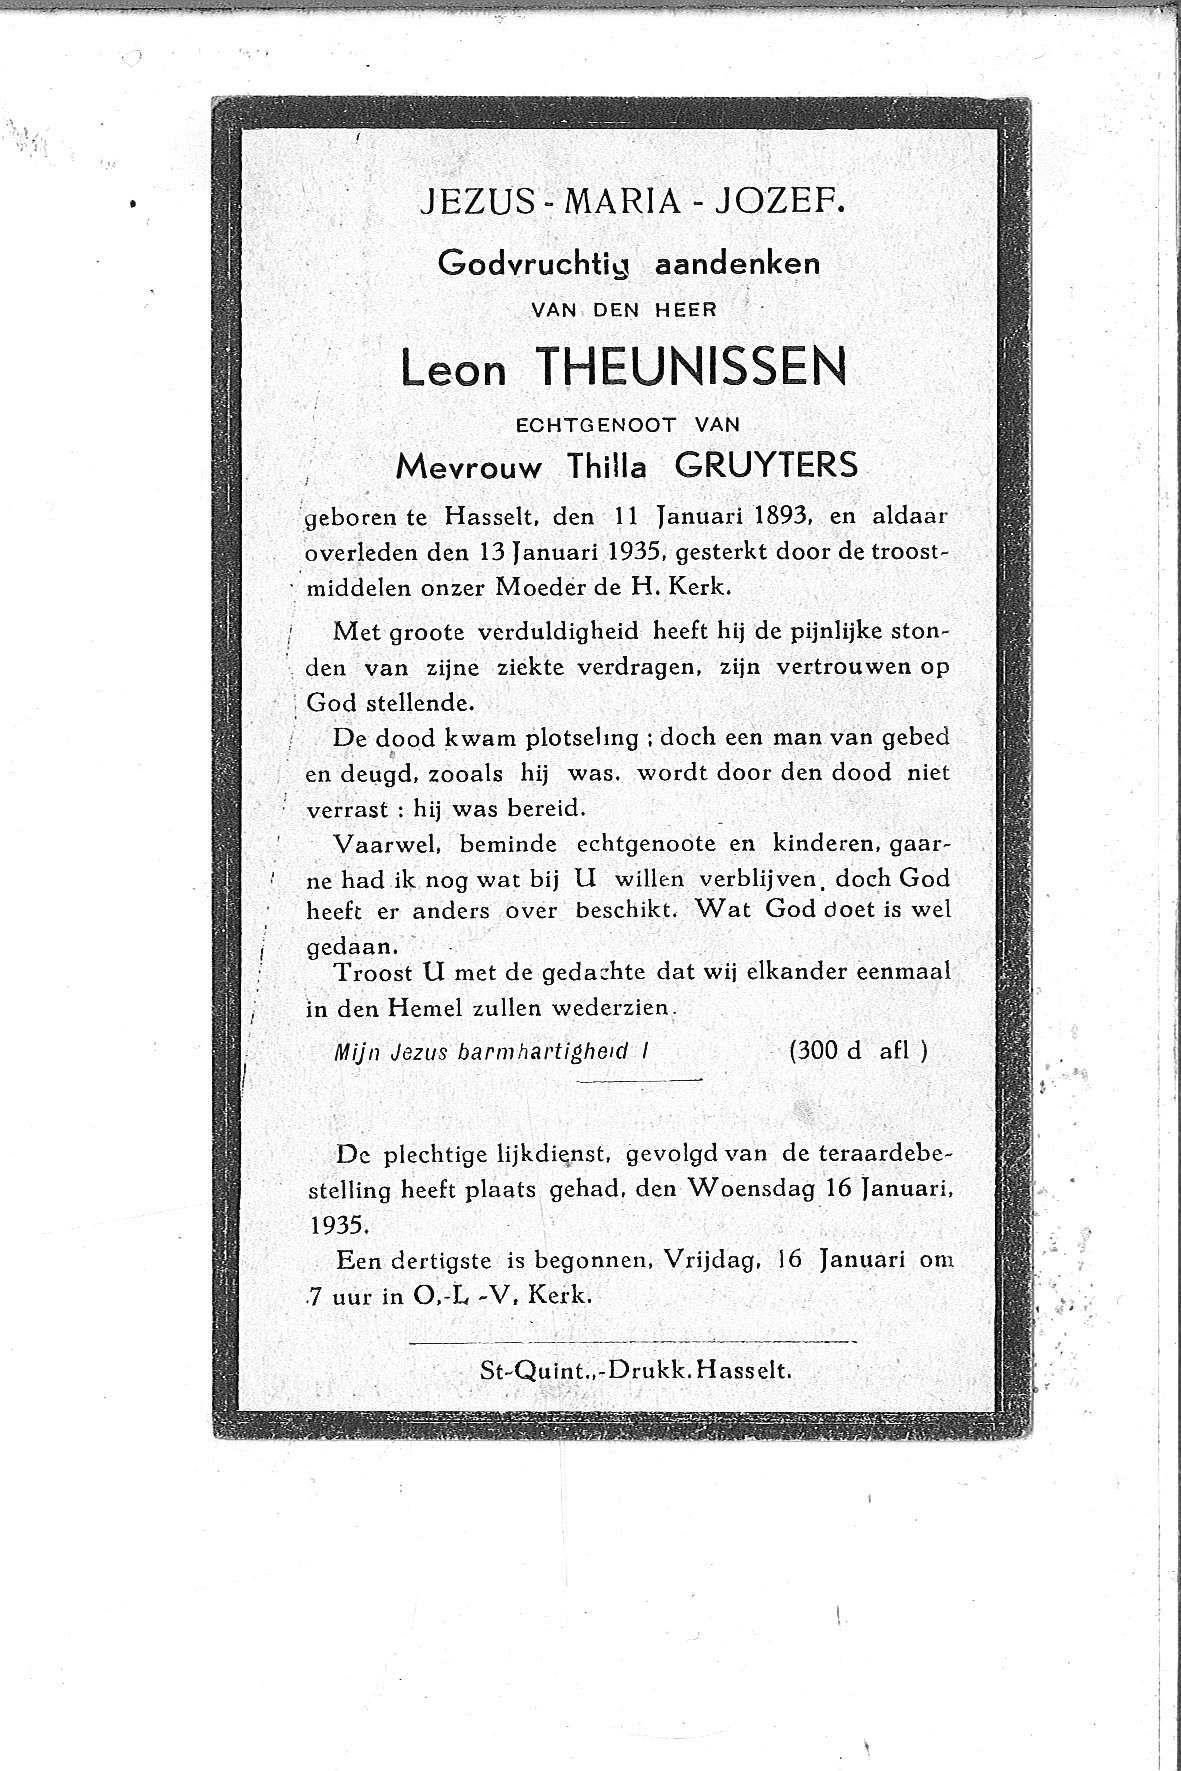 Leon(1935)20140813084409_00034.jpg